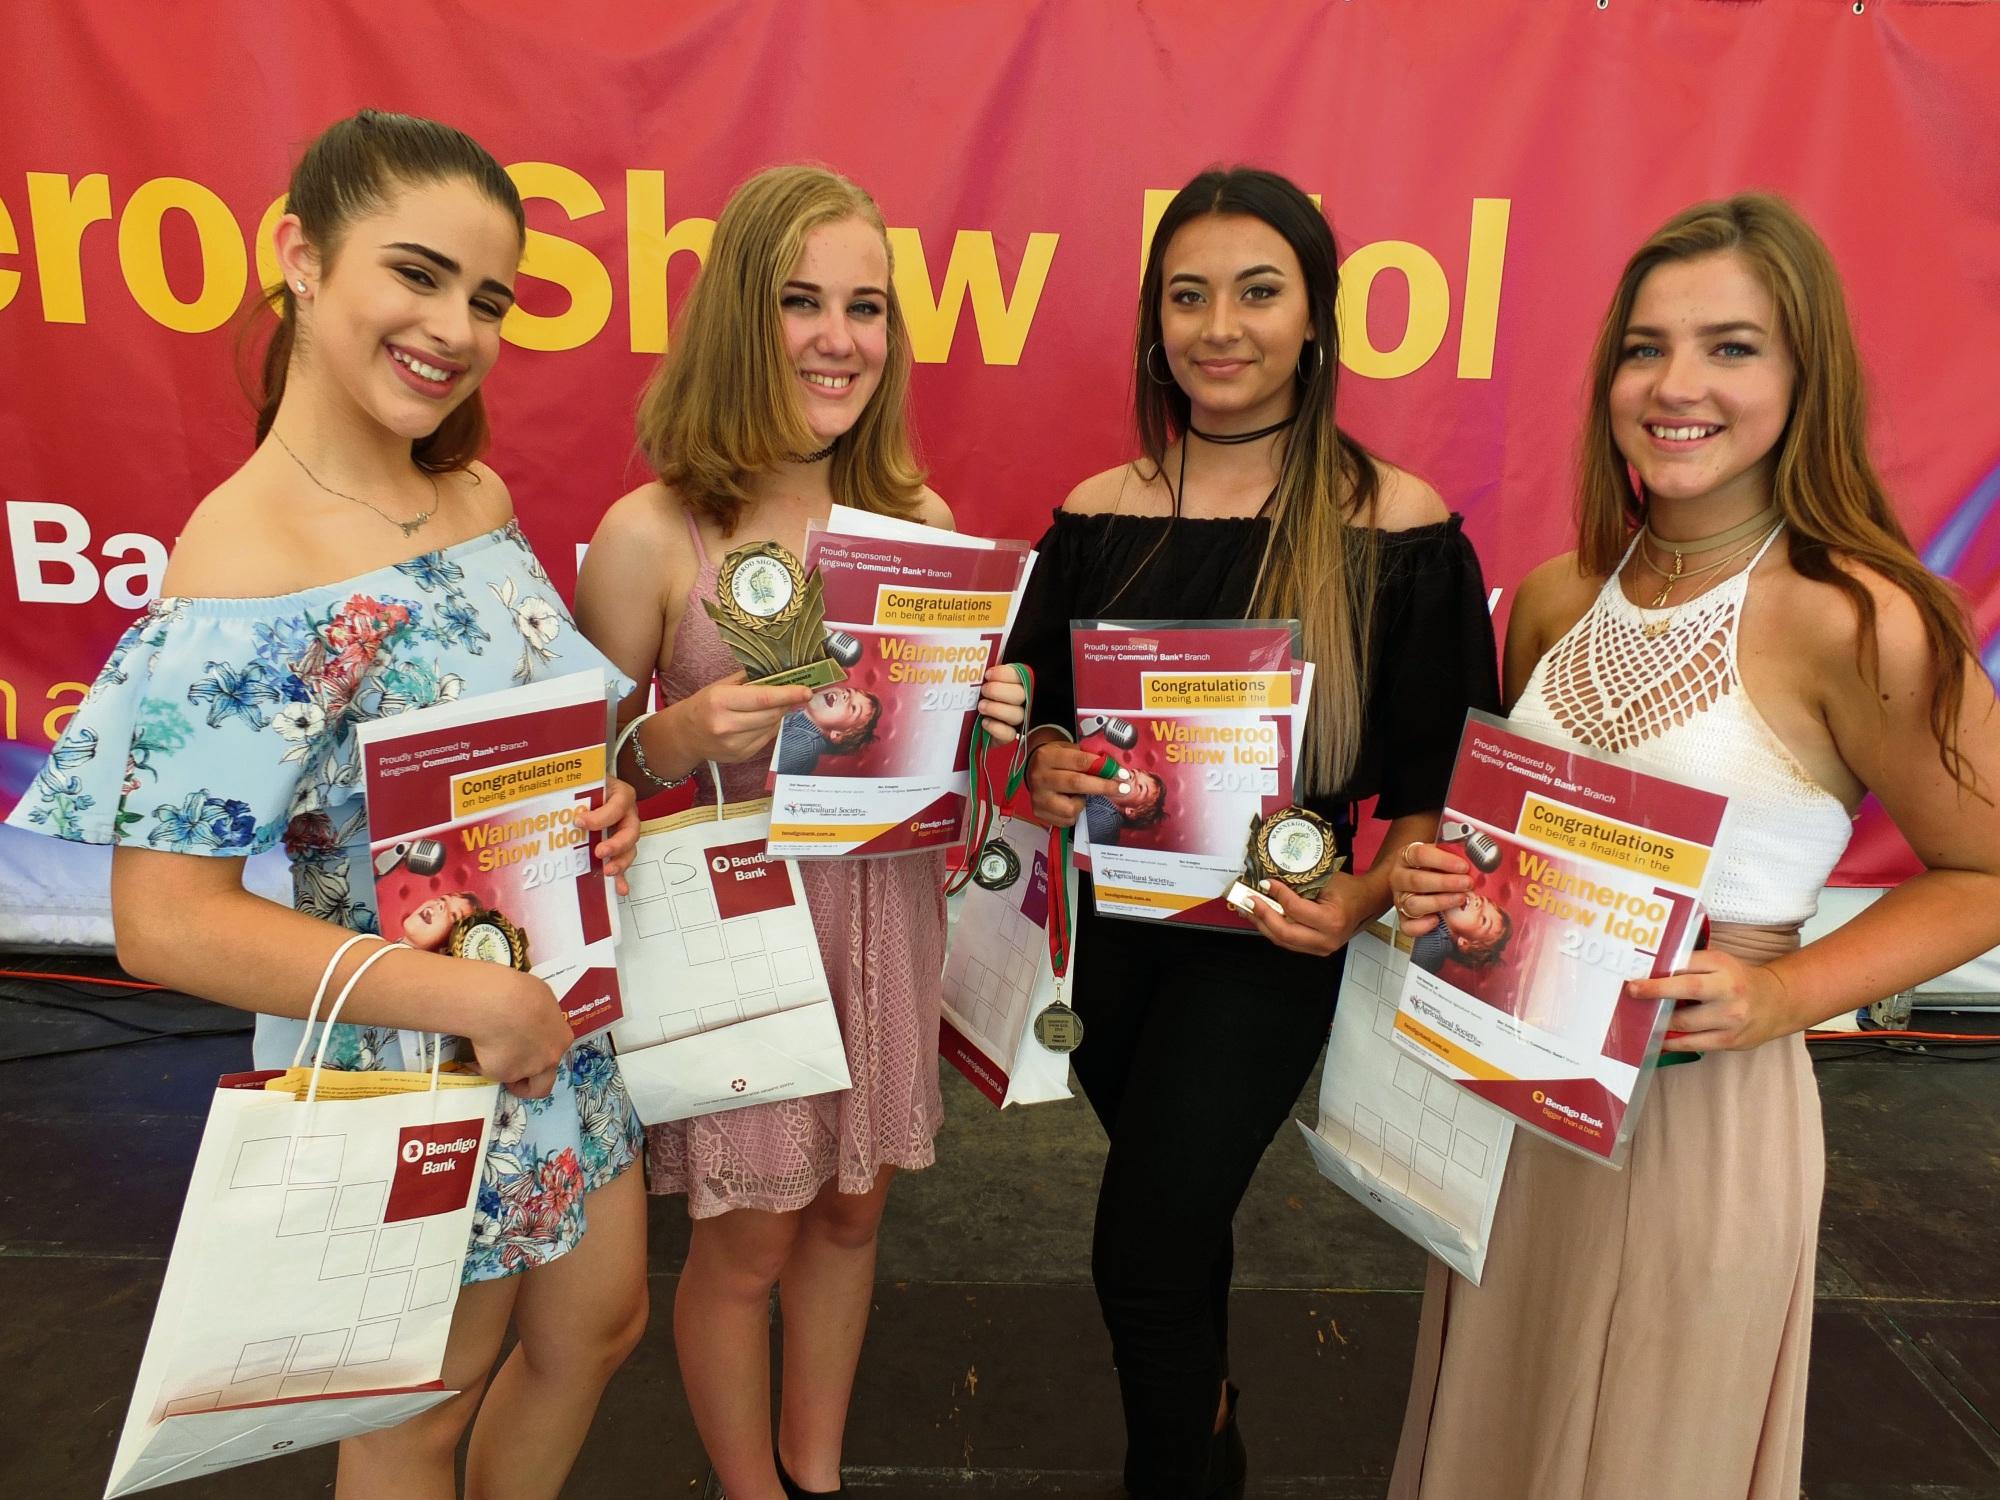 2016 Wanneroo Show Senior Idol winner and runners-up: Jayda D'Agostino (13), Isobel Green (13) Idol winner, Ashley Brown (15), and Claudia Harrison.